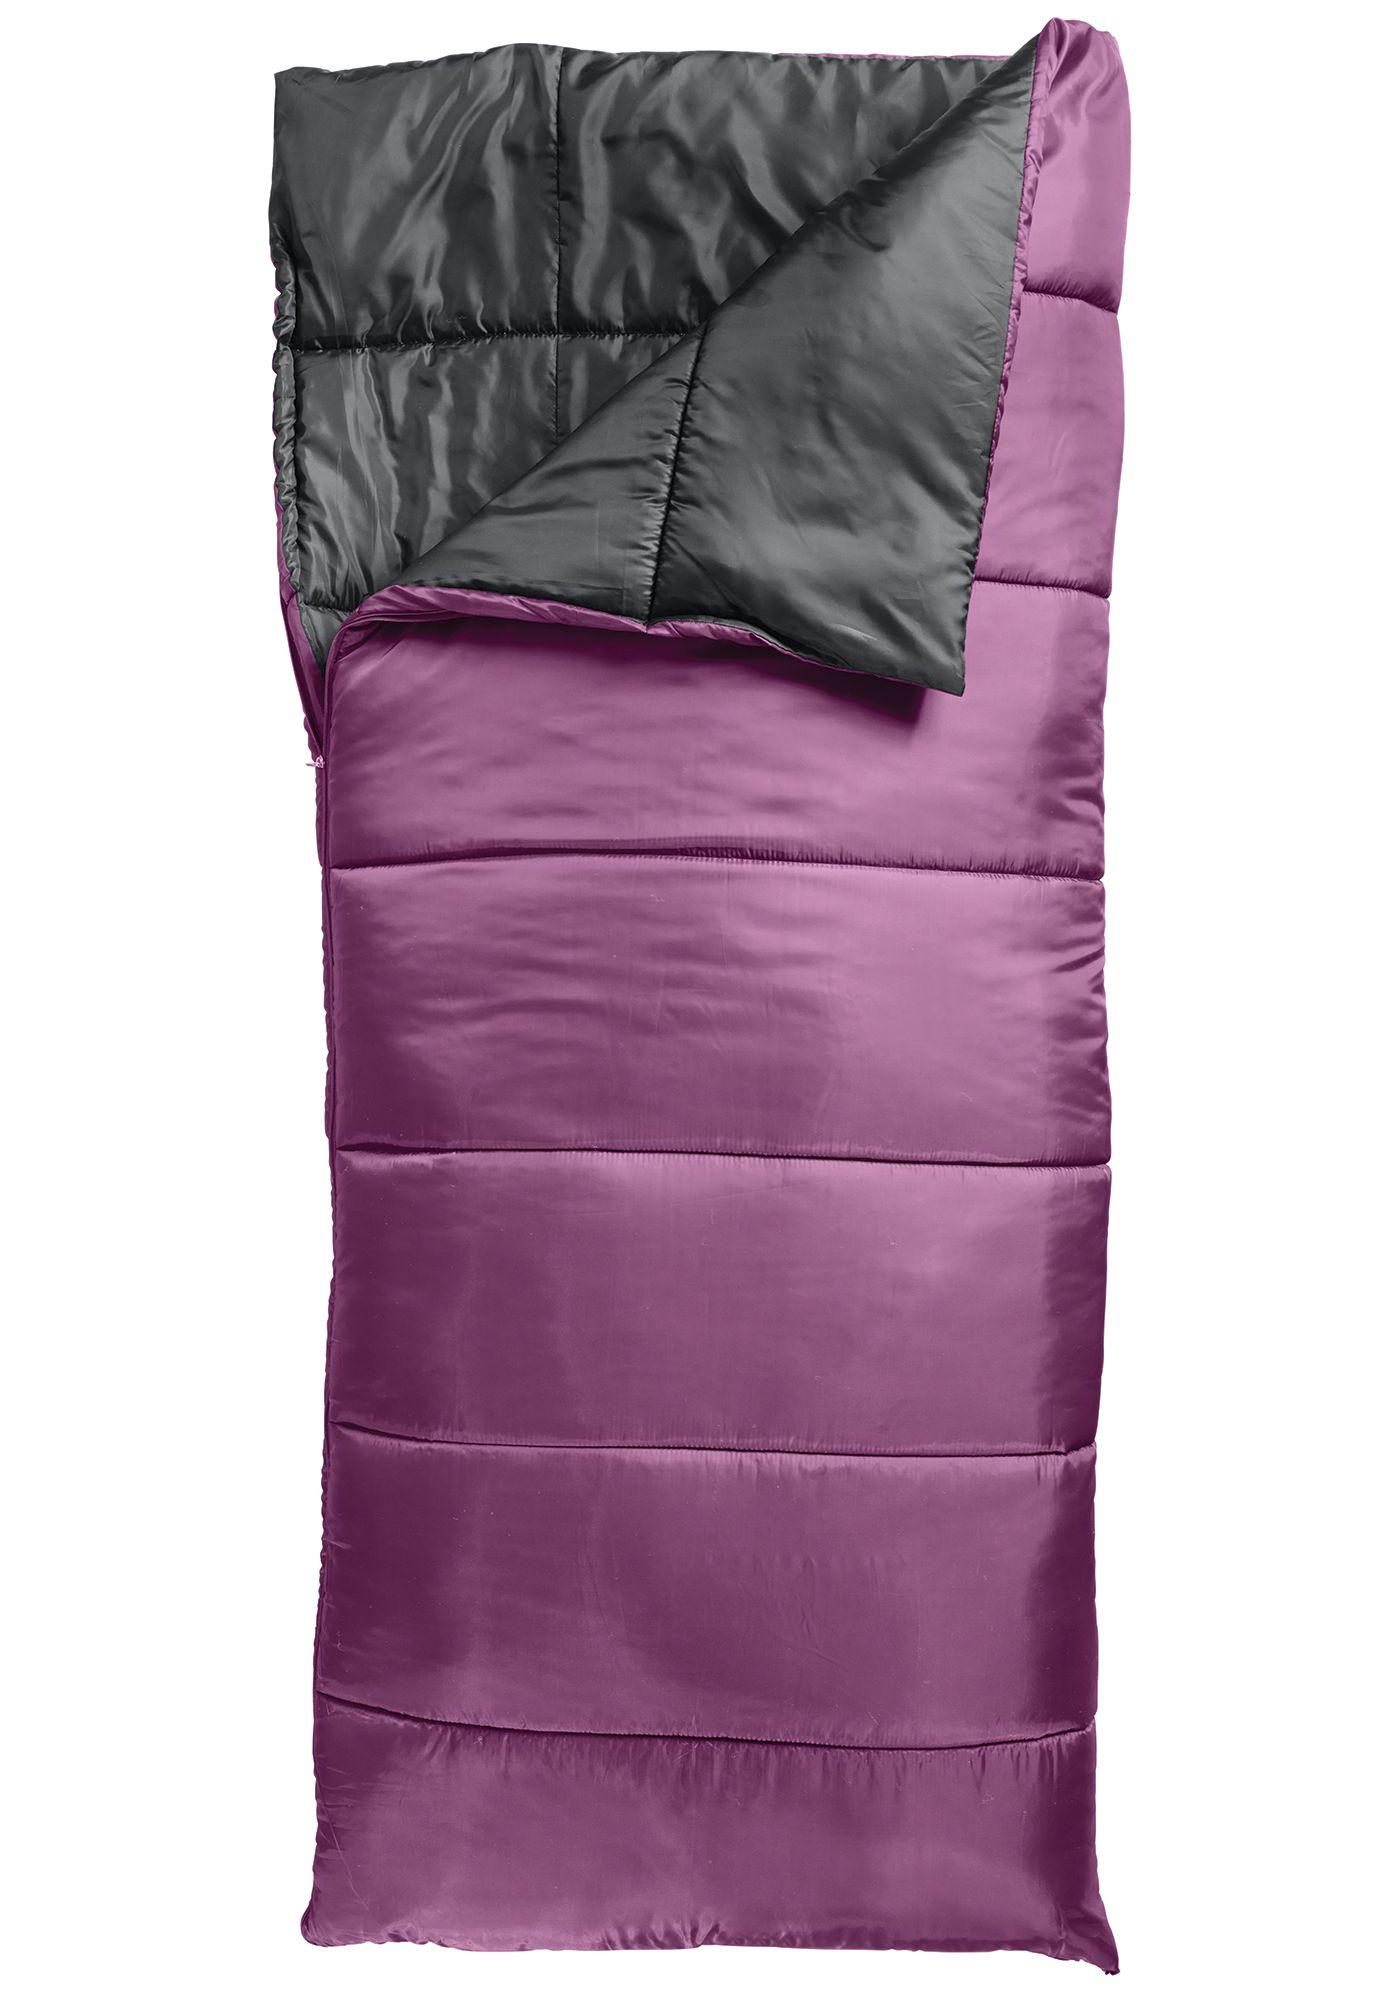 Field & Stream Recreational 50° F Sleeping Bag